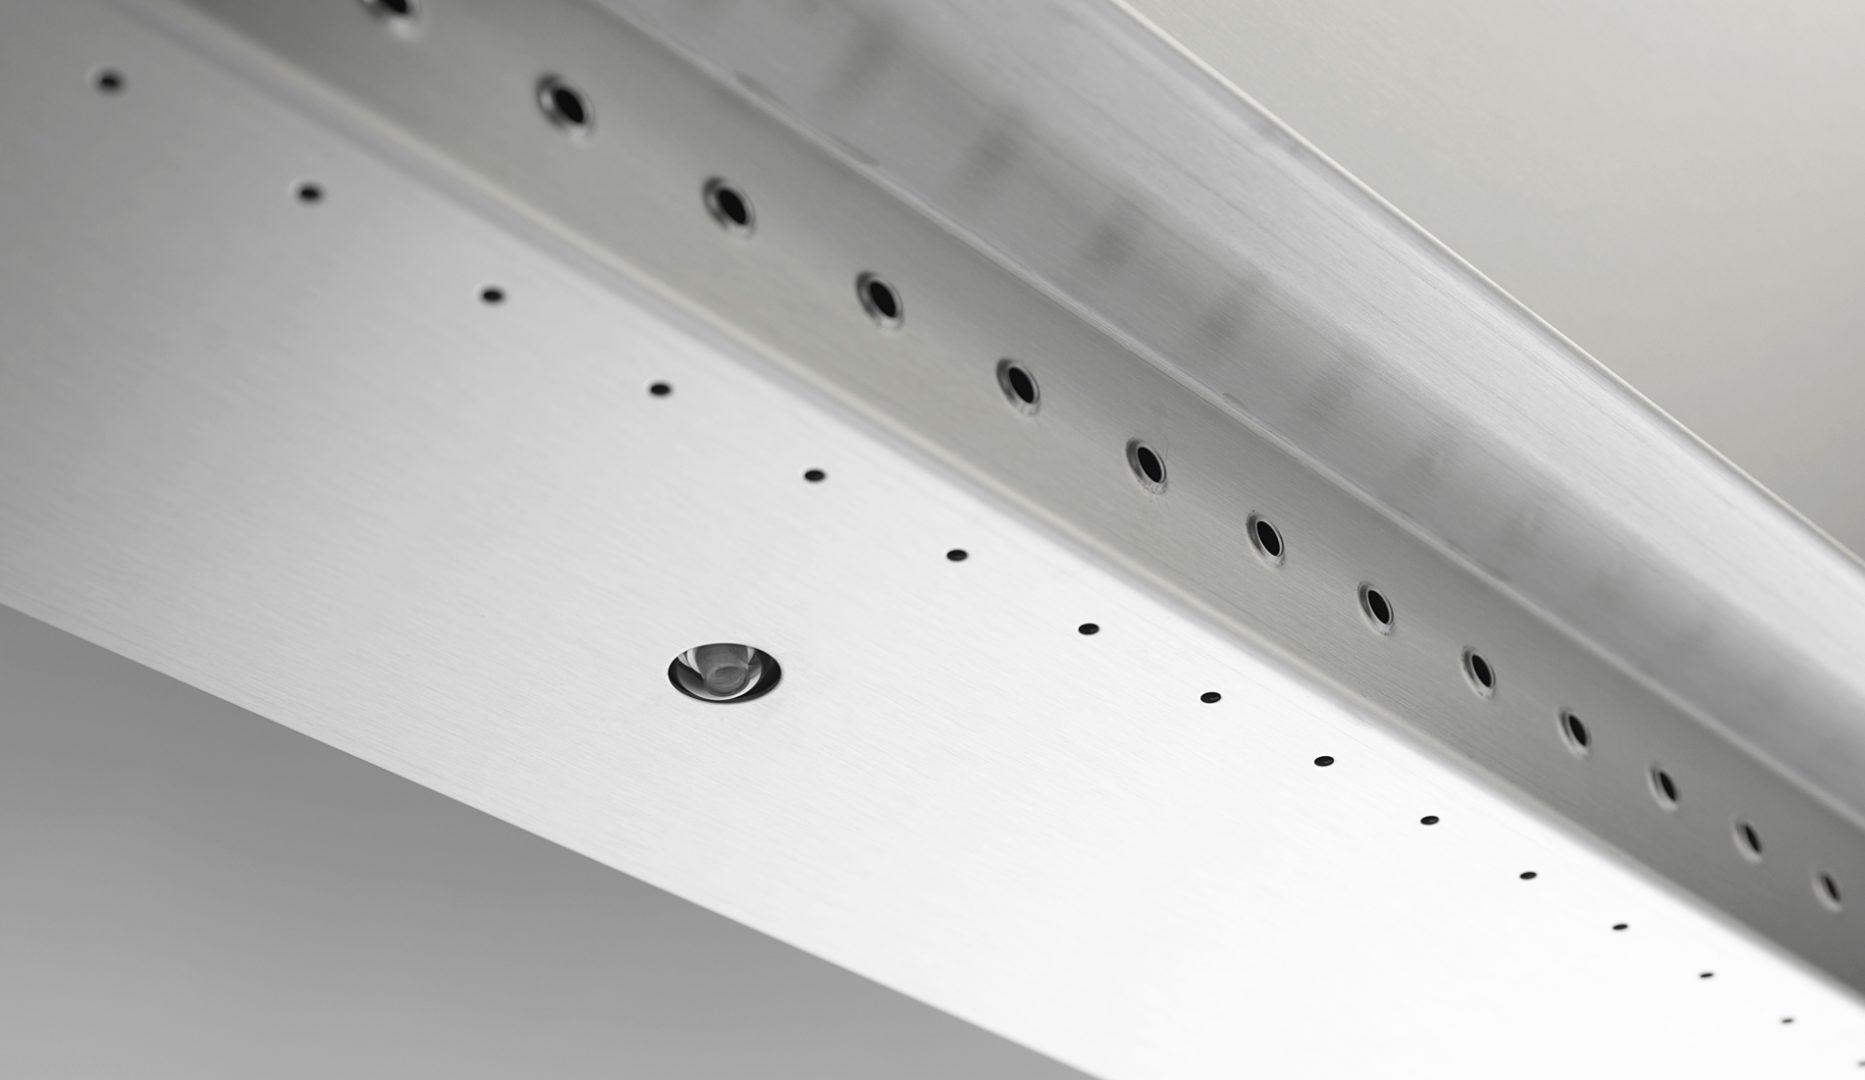 Halton MRV M.A.R.V.E.L. energy saving technology